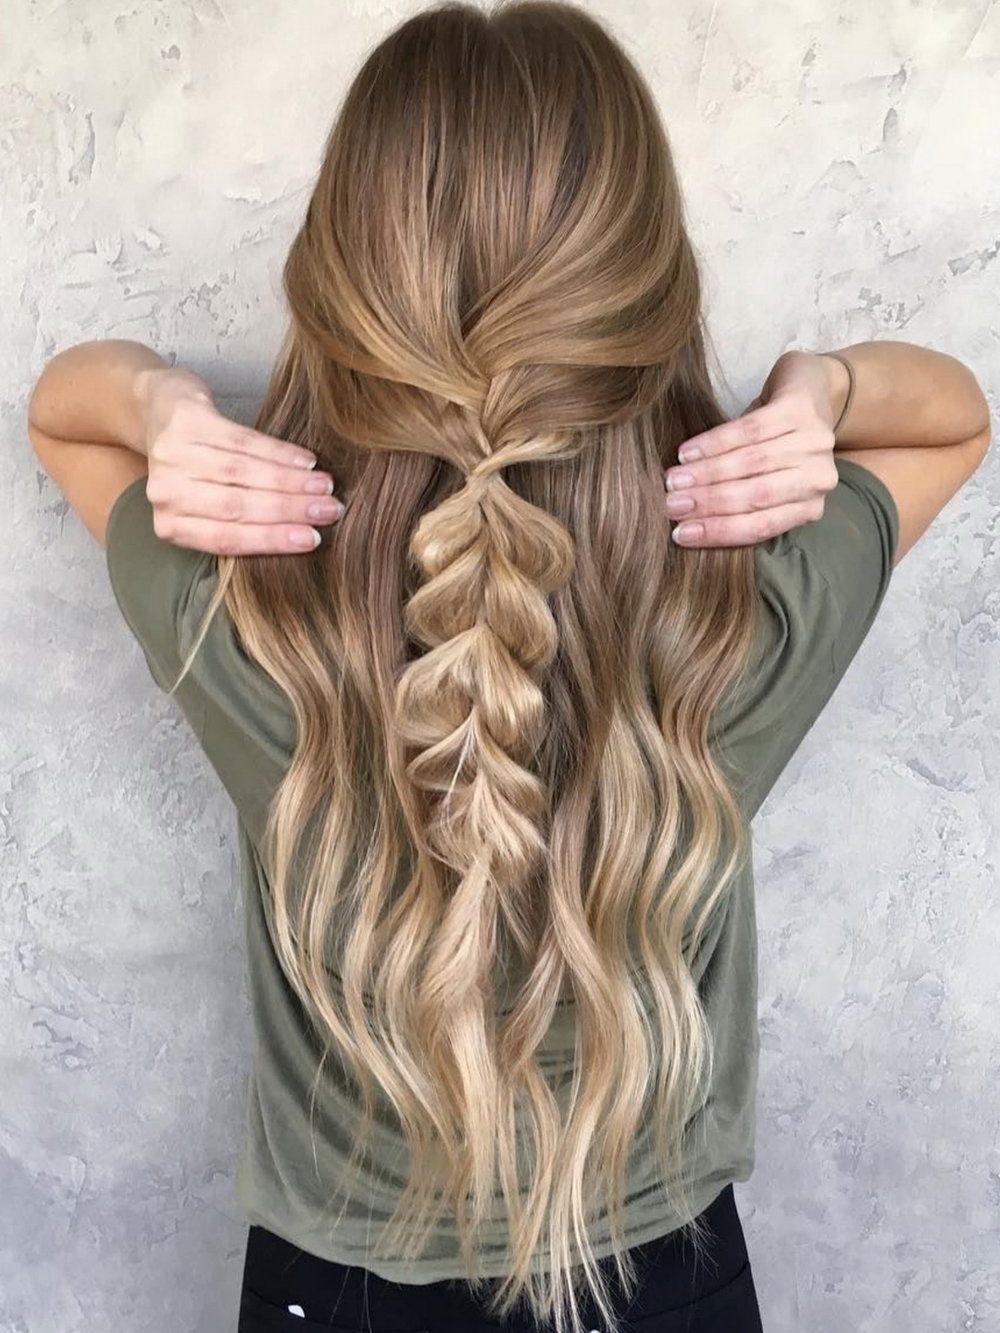 Stunning Braided Hairstyles in Hair Pinterest Hair